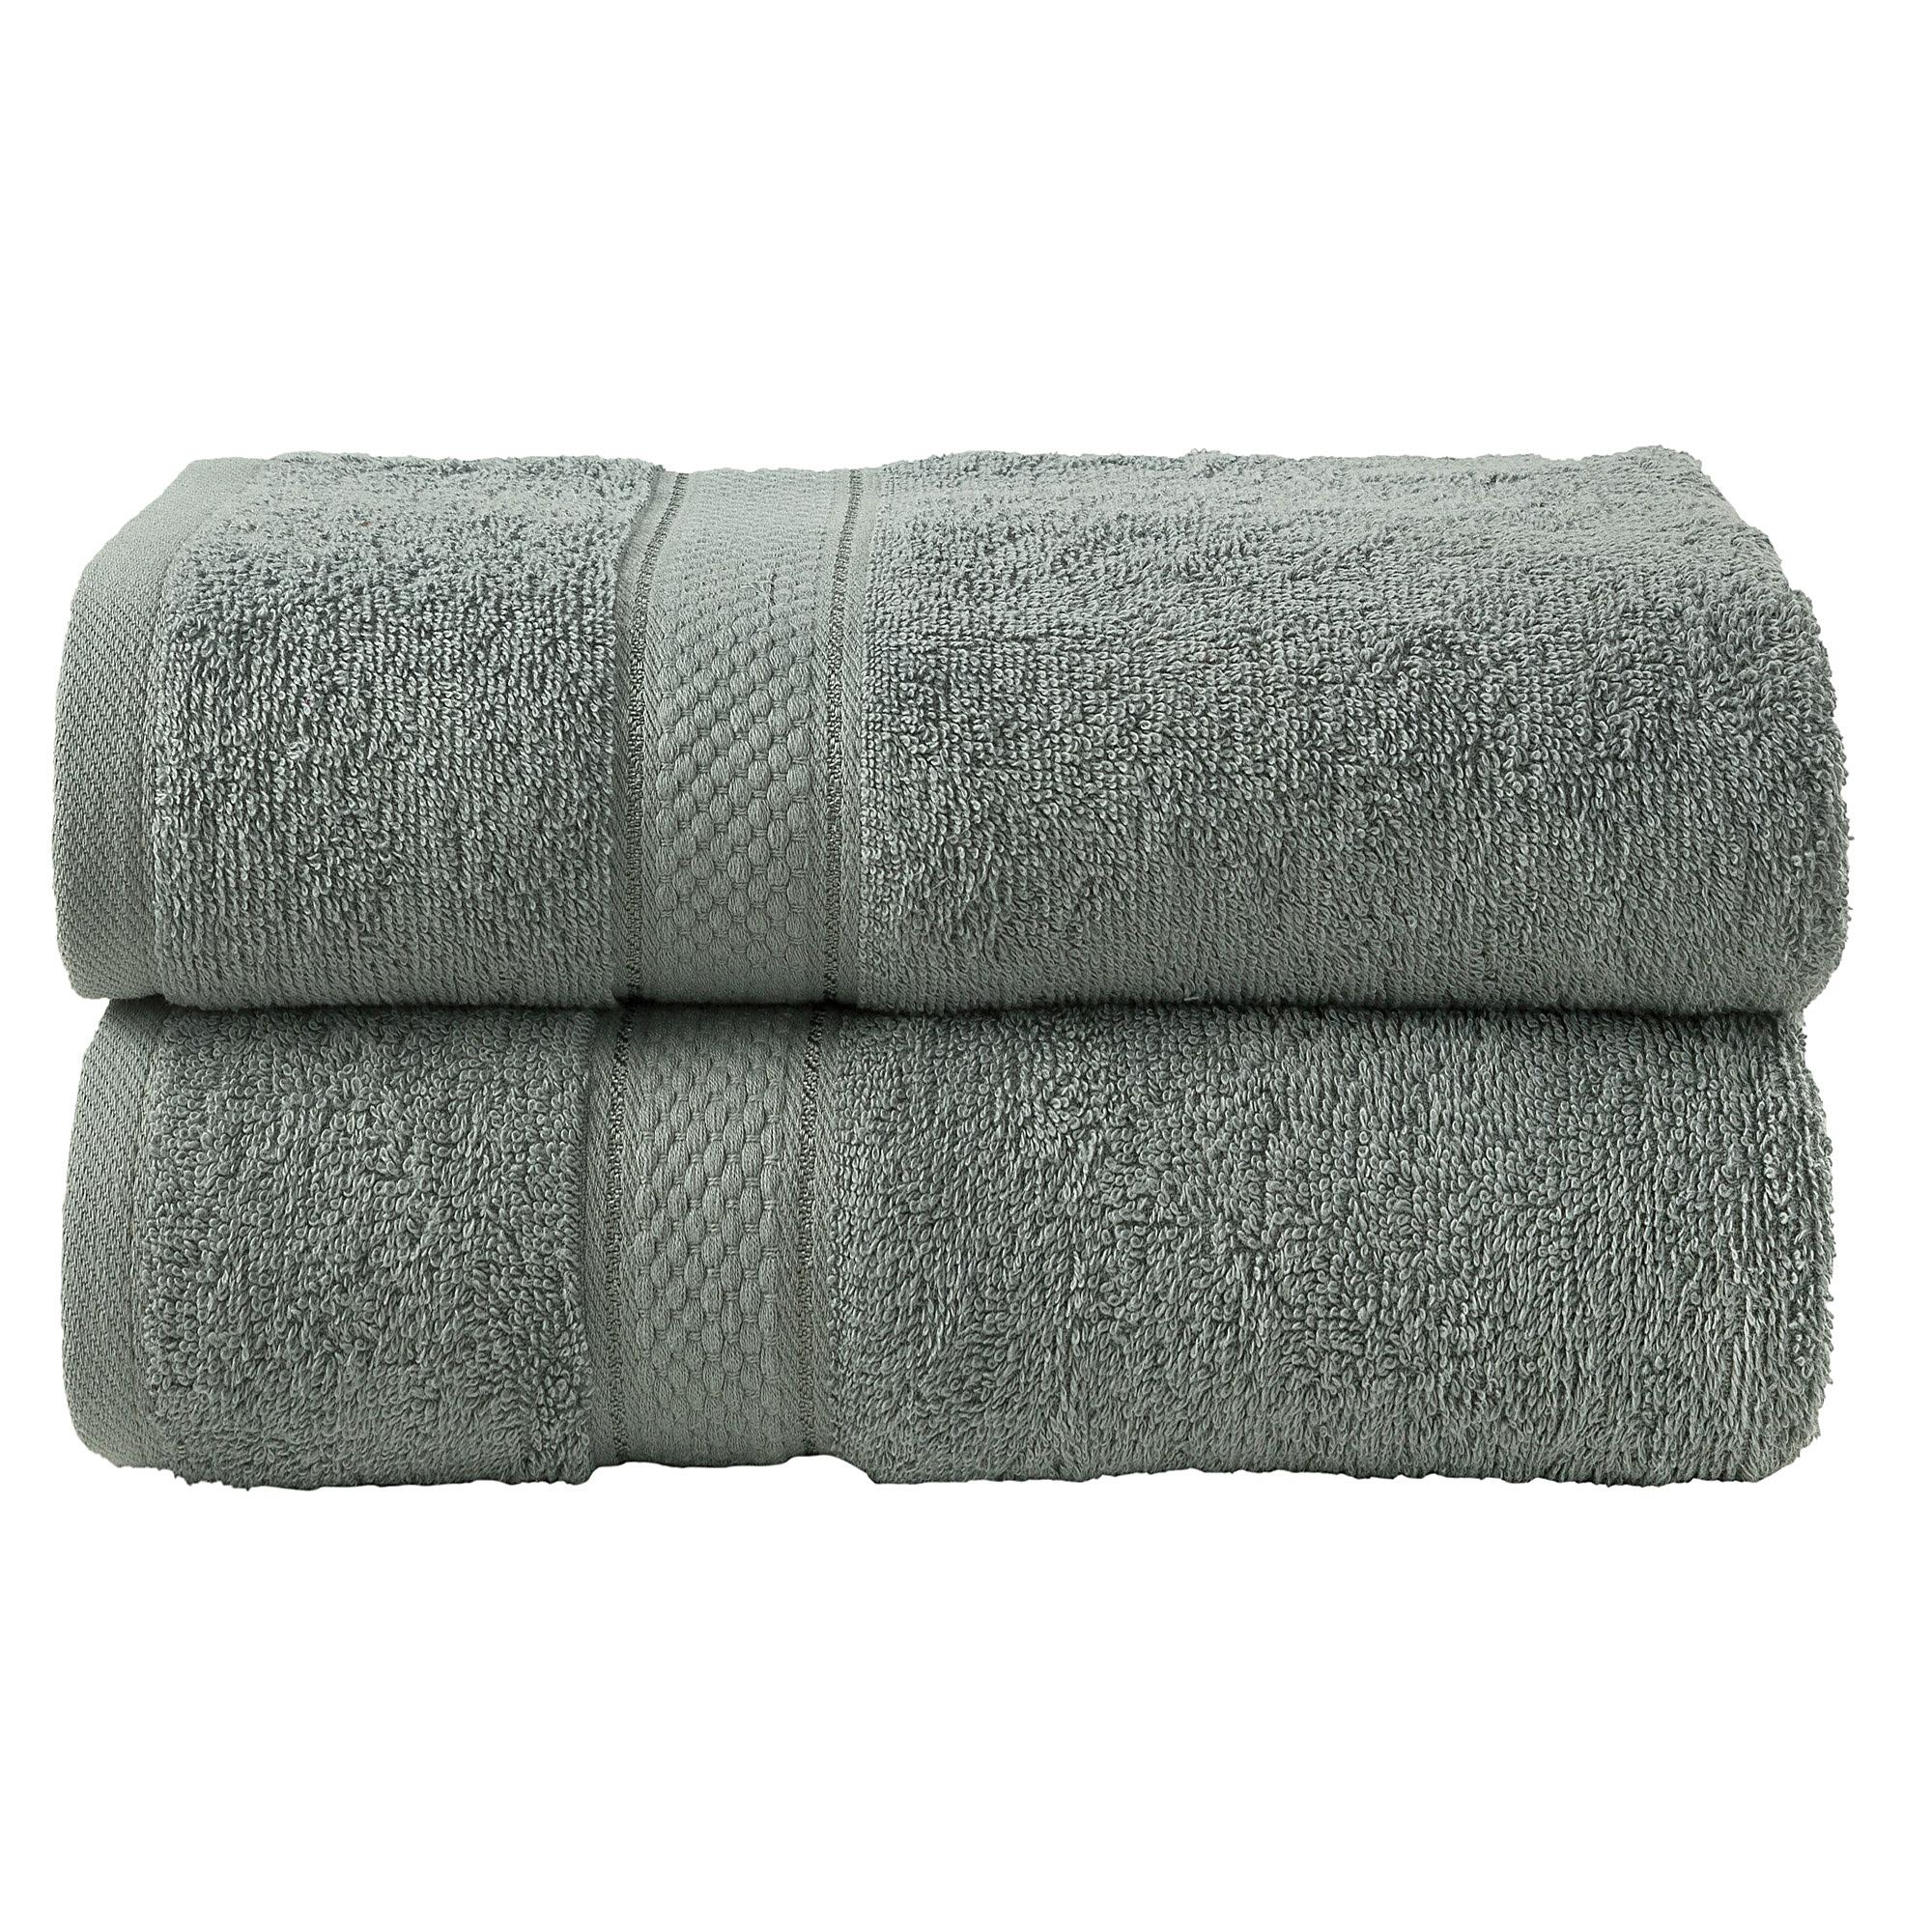 2 Pcs Bath Cotton Towel Bale Set Silver Plain